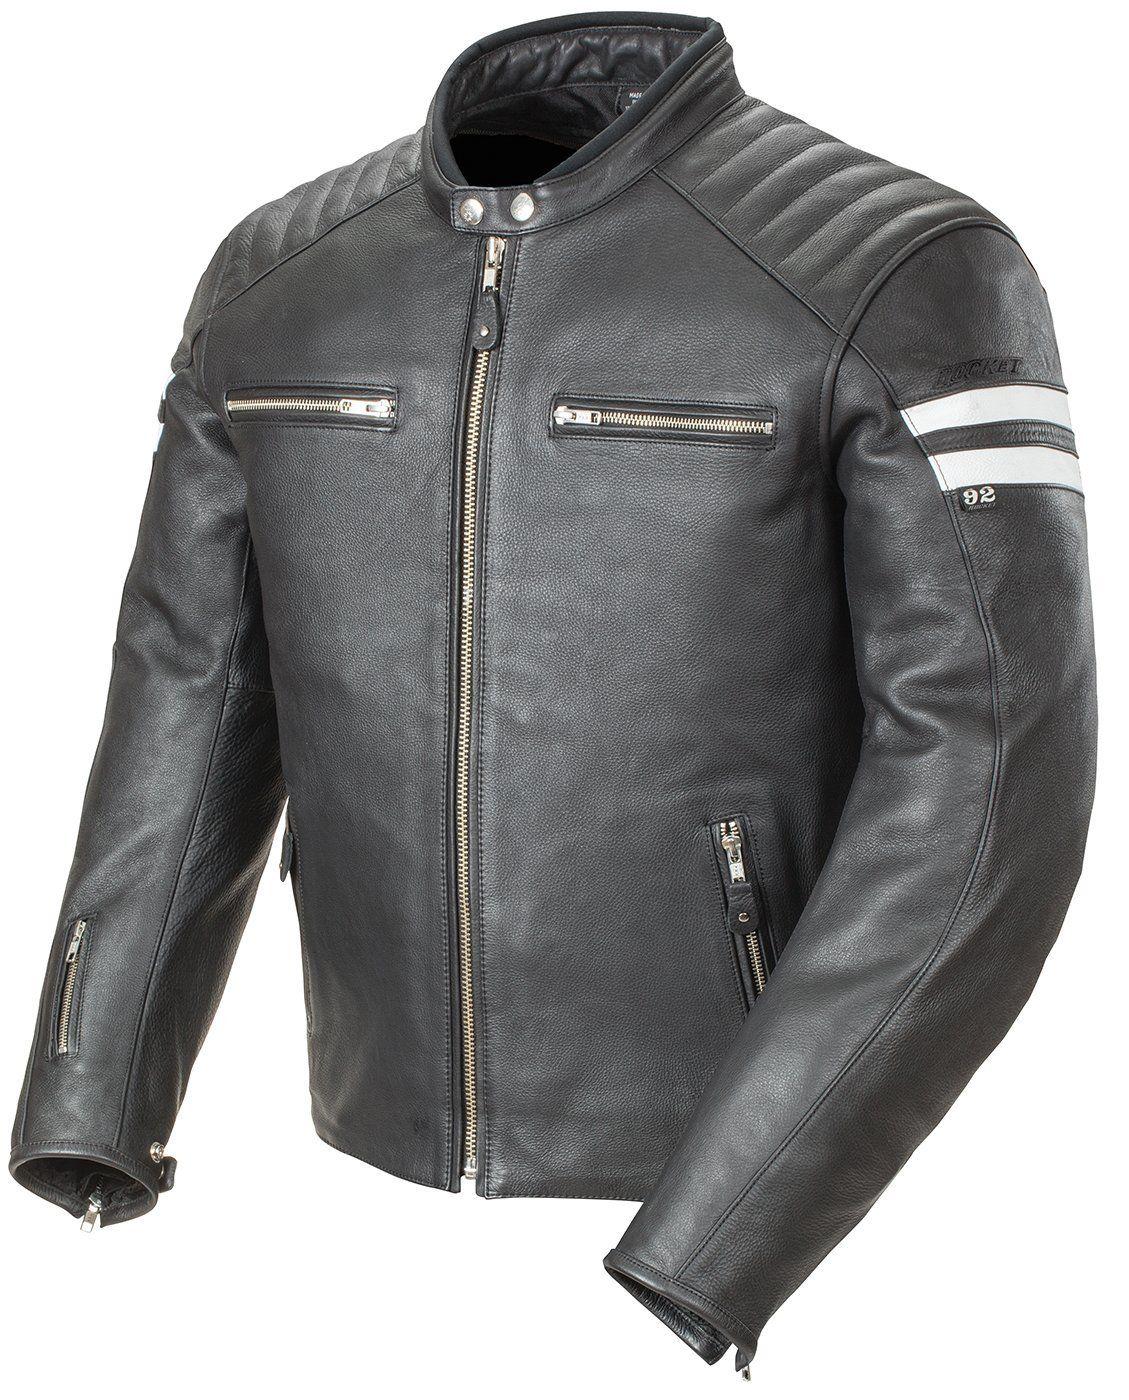 Joe rocket leather motorcycle gloves - Joe Rocket Classic 92 Men S Leather Motorcycle Jacket Black White